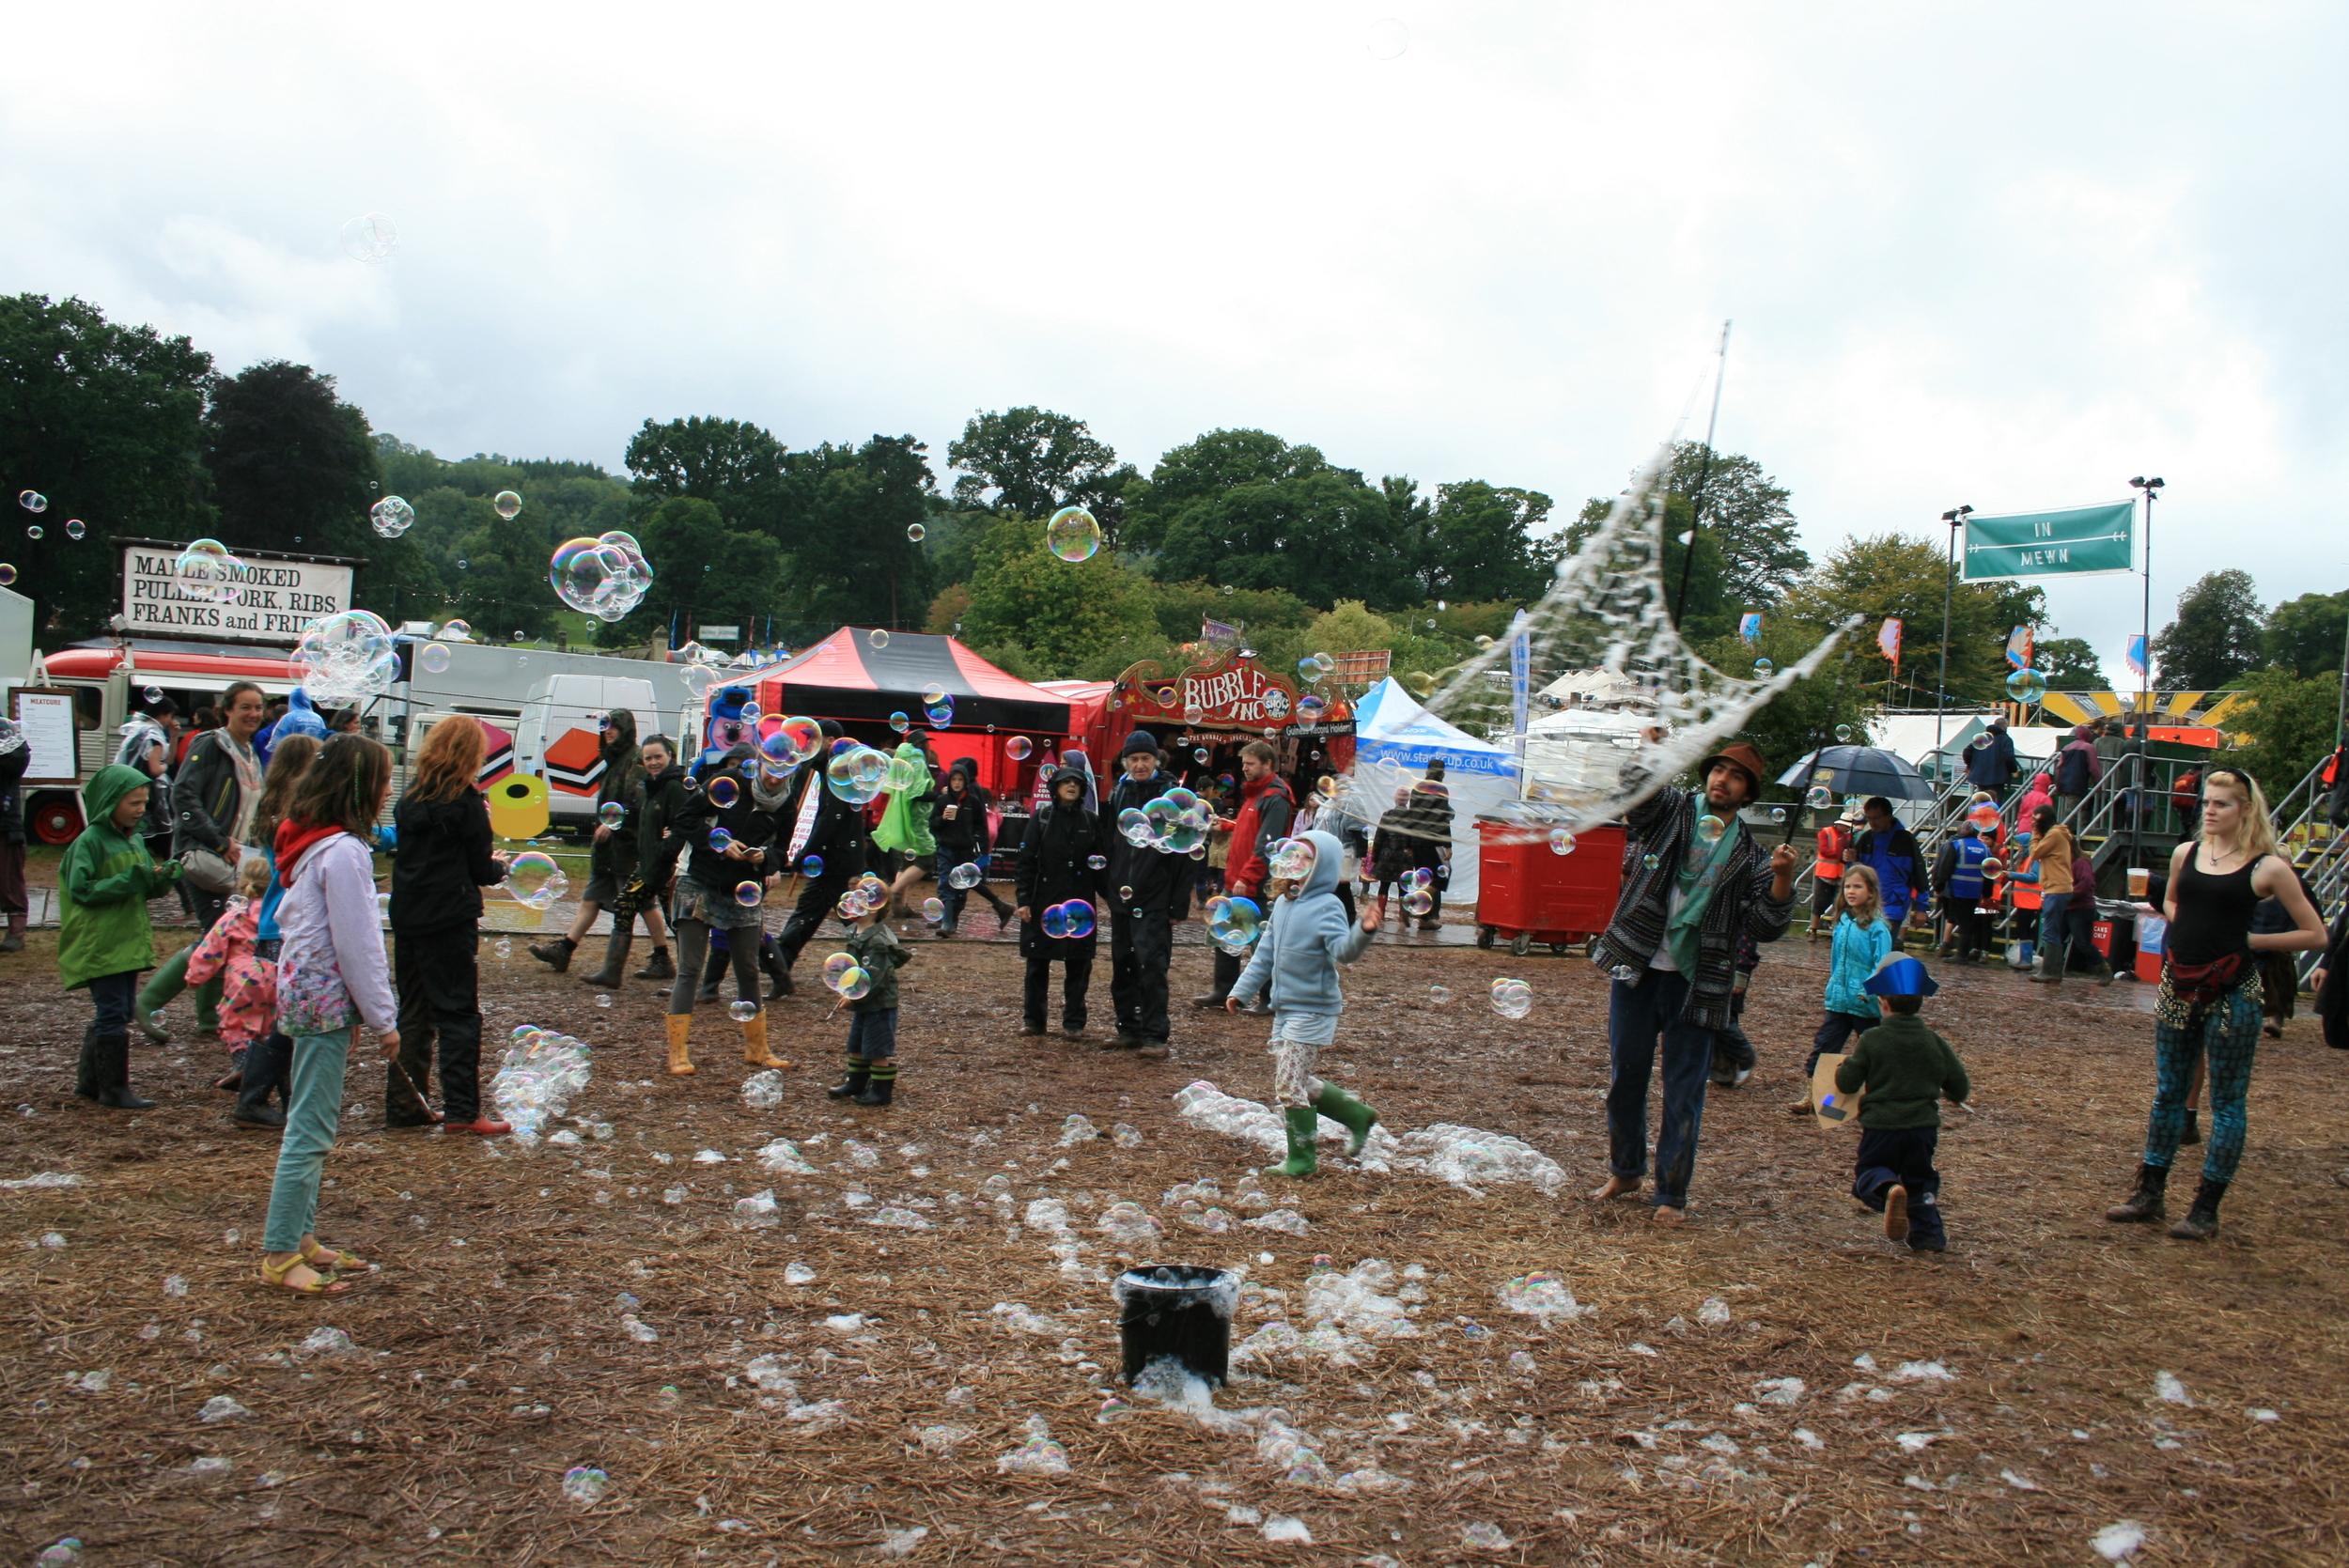 Children go crazy for the bubbles!